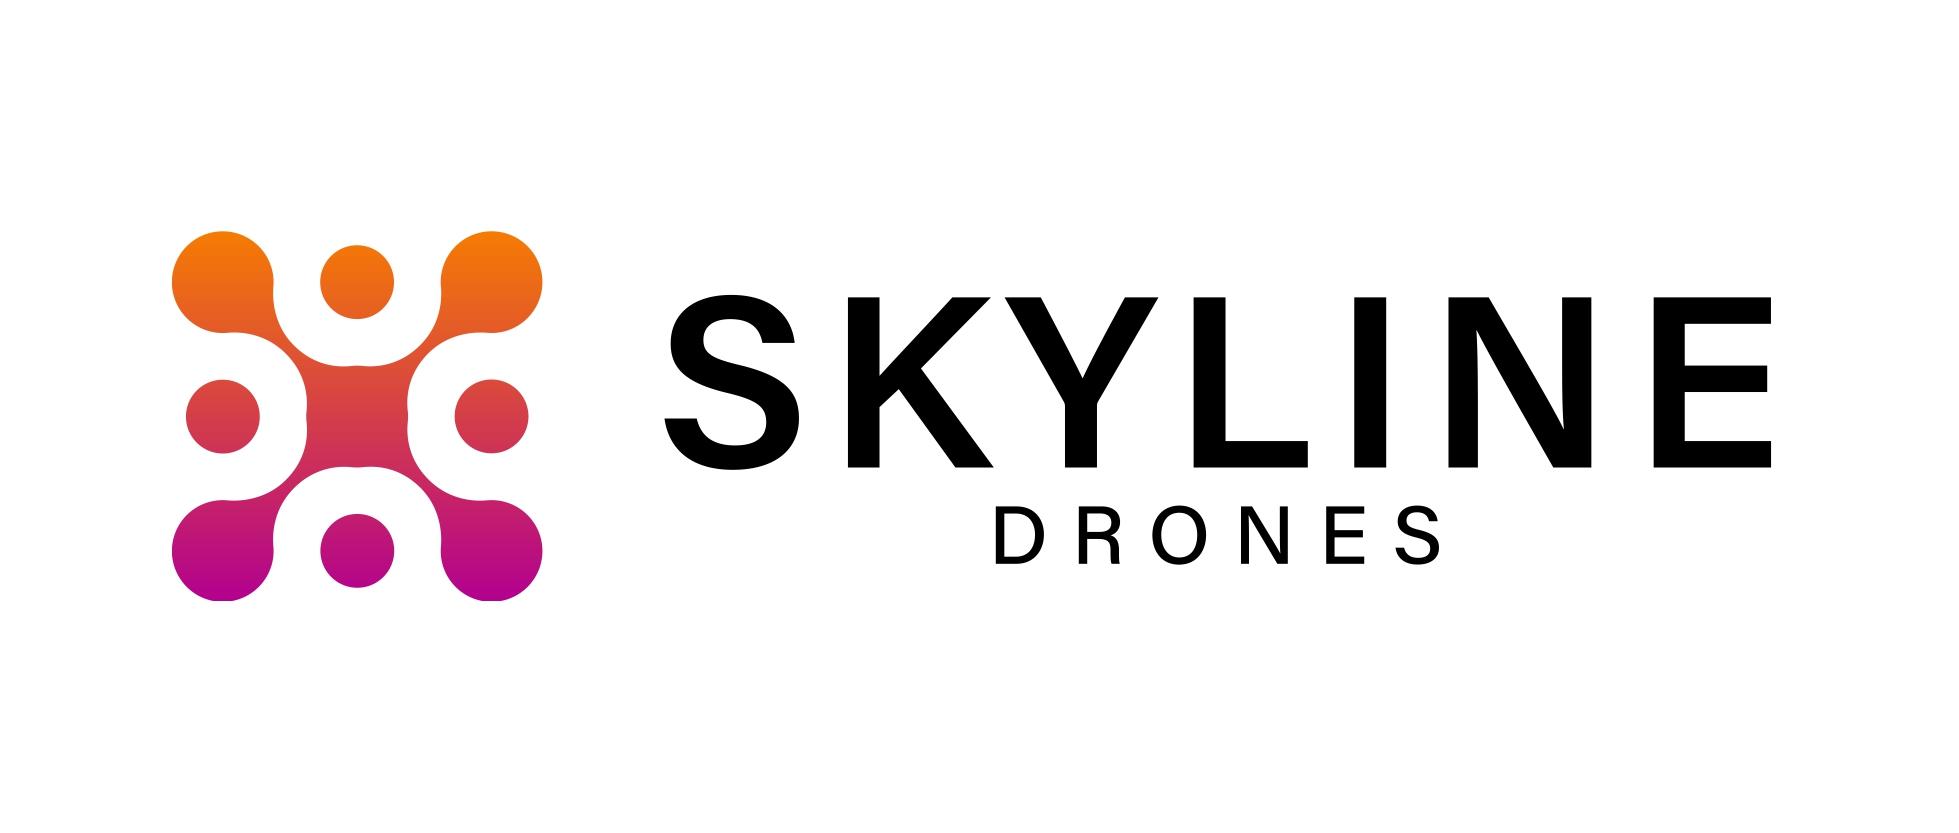 Skyline Drones